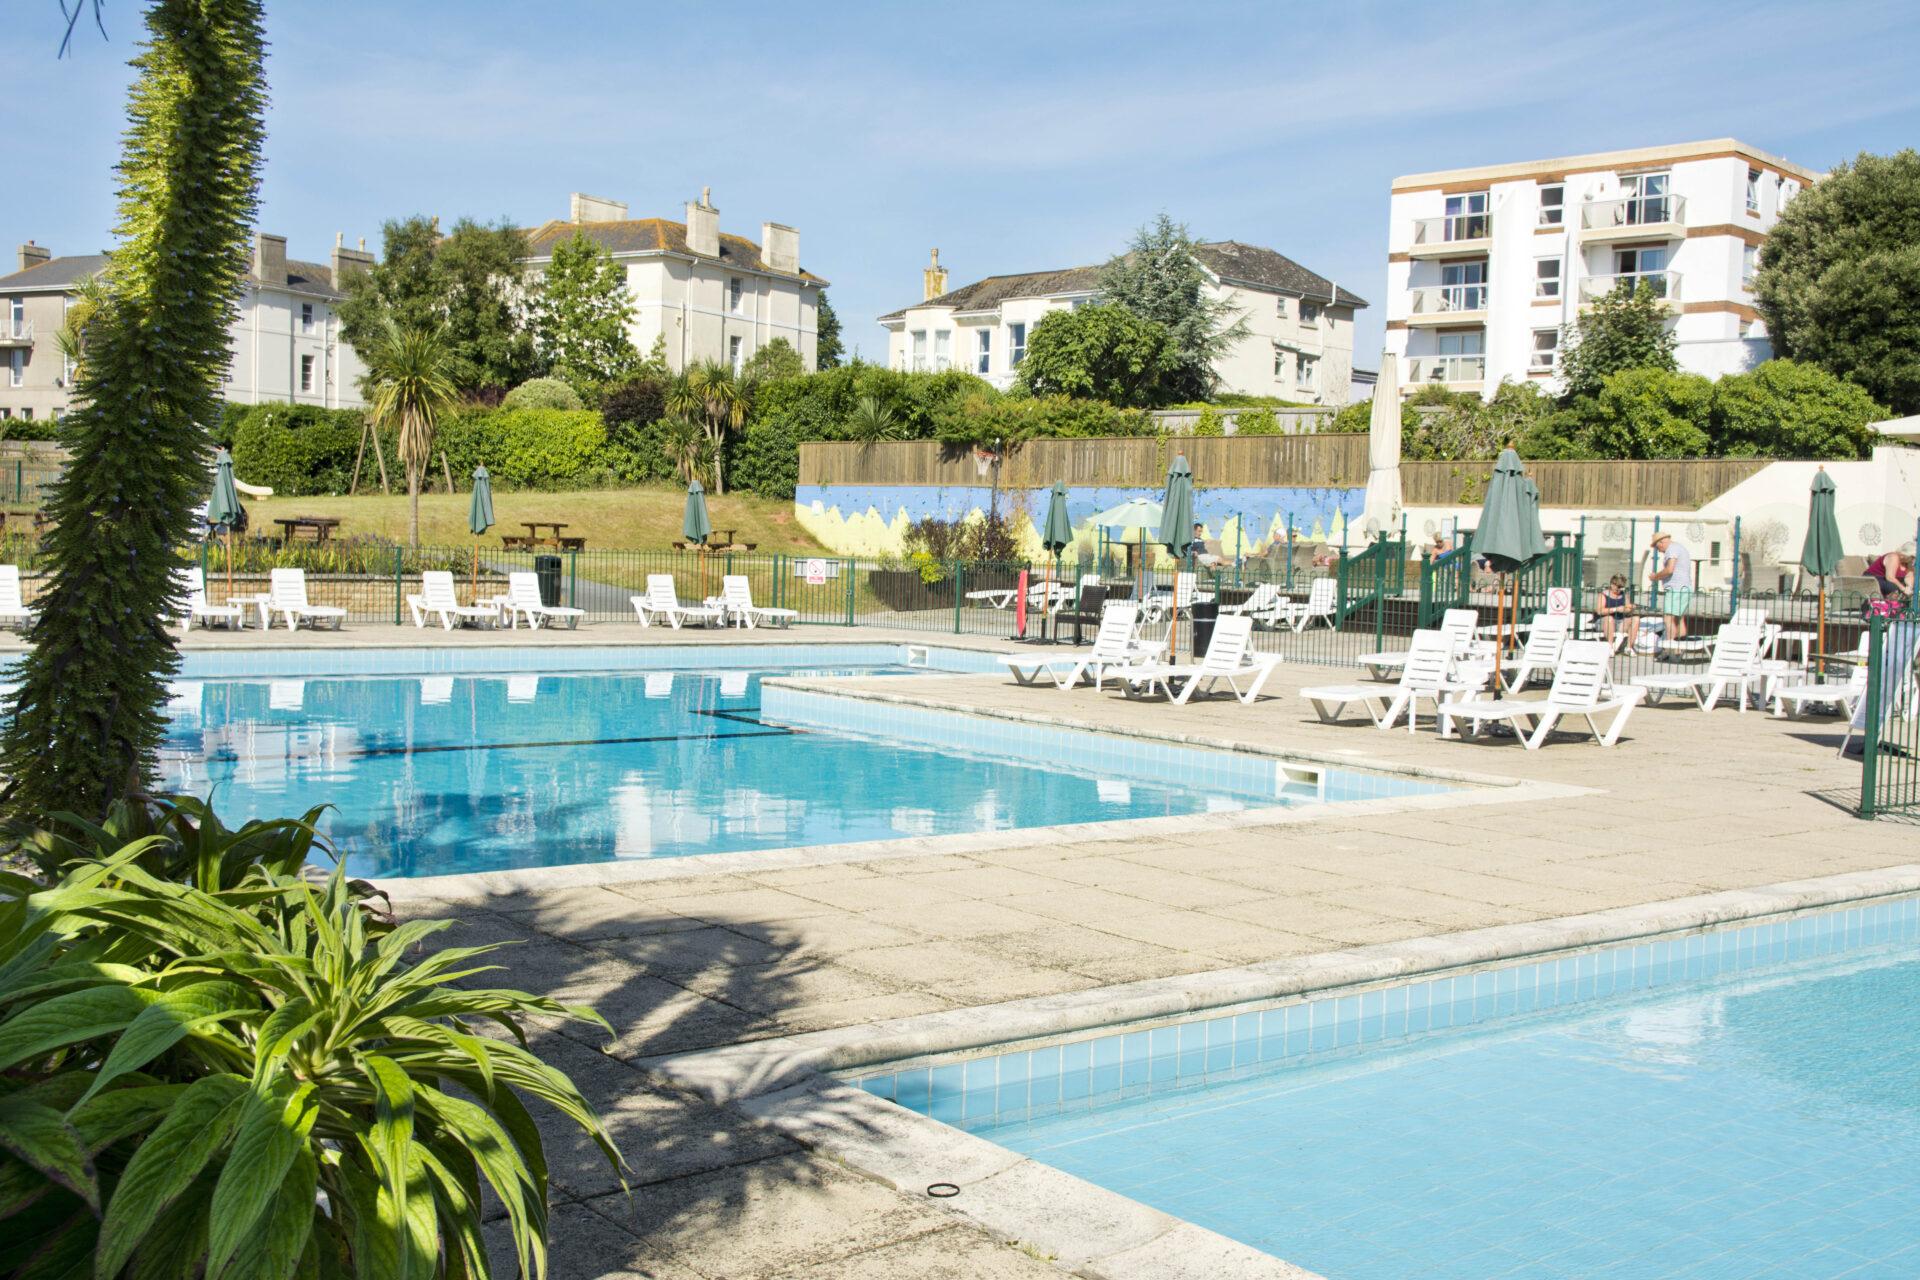 TLH Leisure Resort, Torquay, Outdoor Swimming Pools